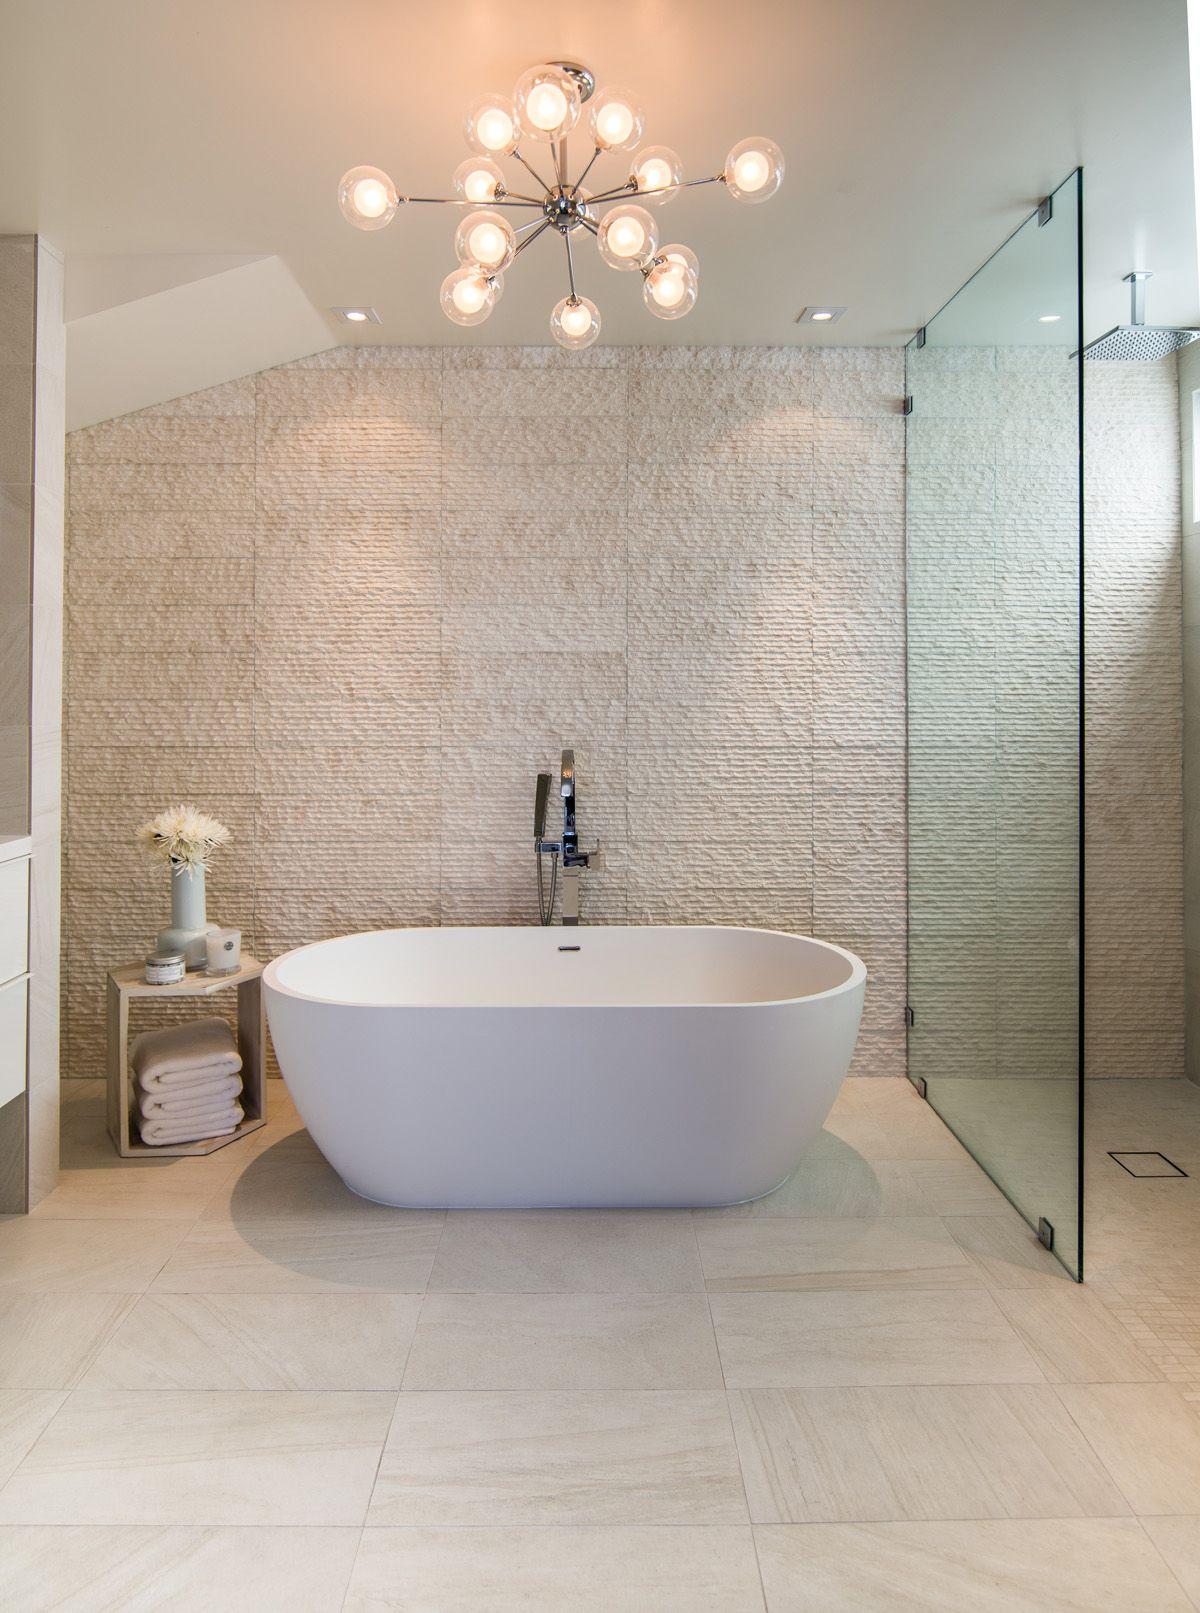 DW191G (20 x 20) in 2020 Basement remodeling, Bathroom